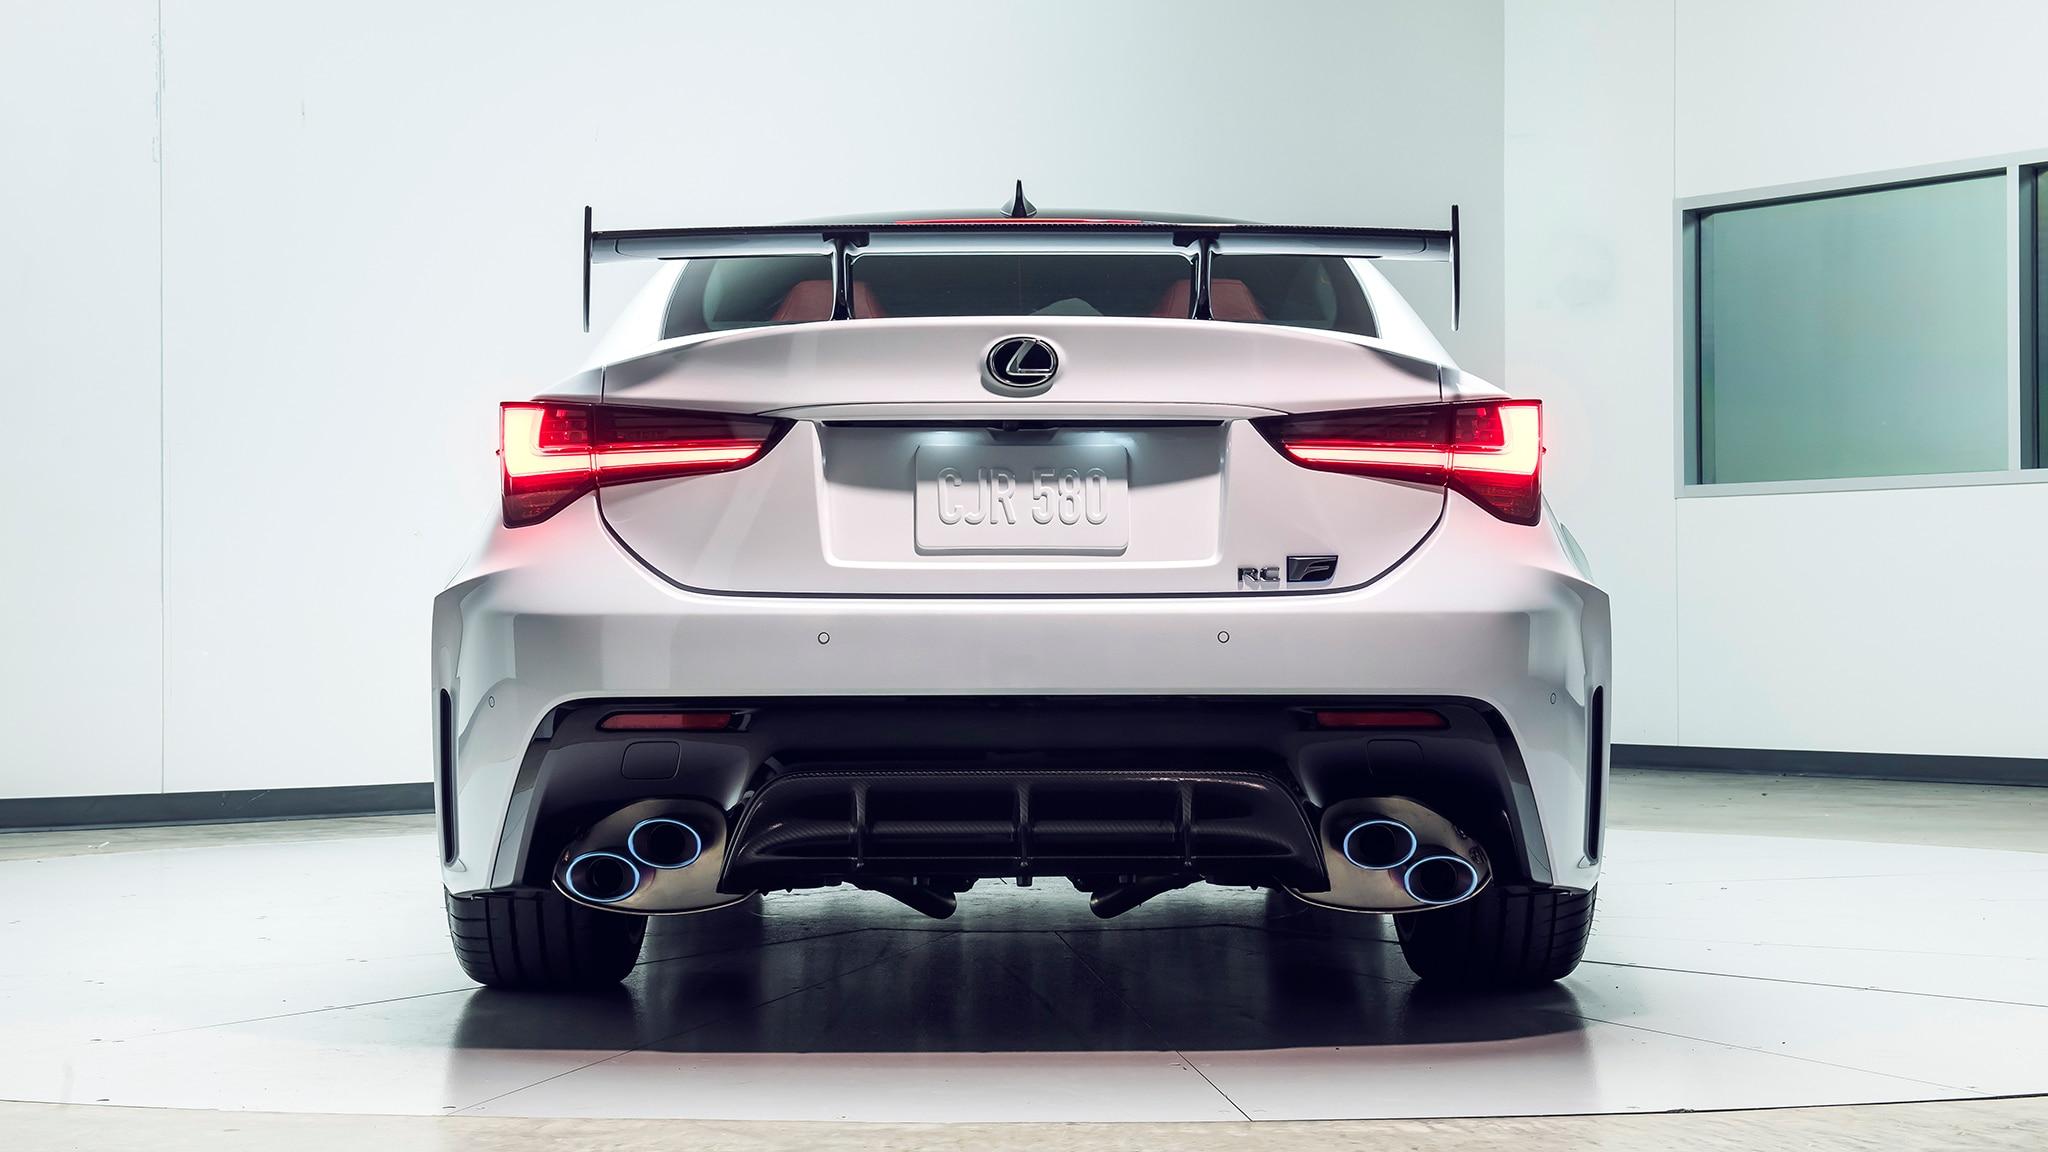 The Lexus Rc F Track Edition Is The Hardest Core Lexus Since The Lfa